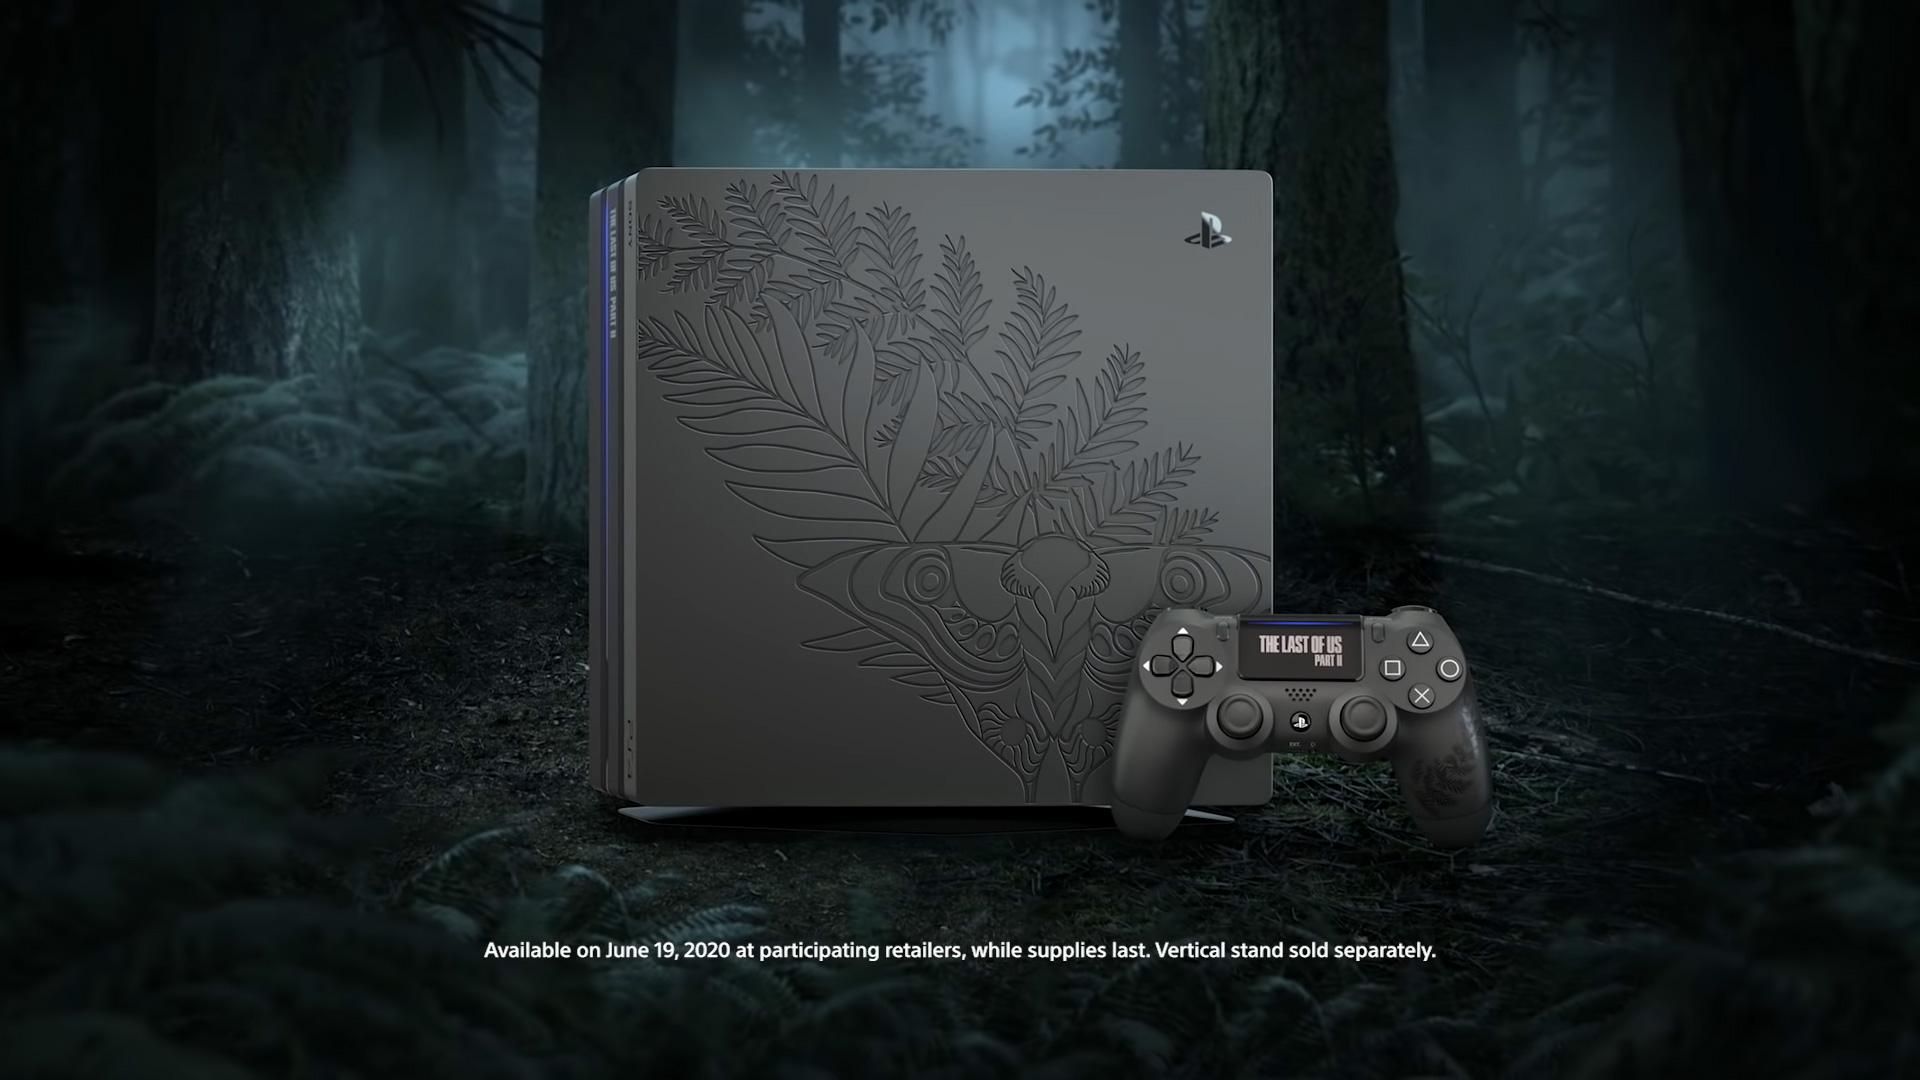 The Last of Us Part II PS4 Pro is rocking Ellie's tattoo screenshot